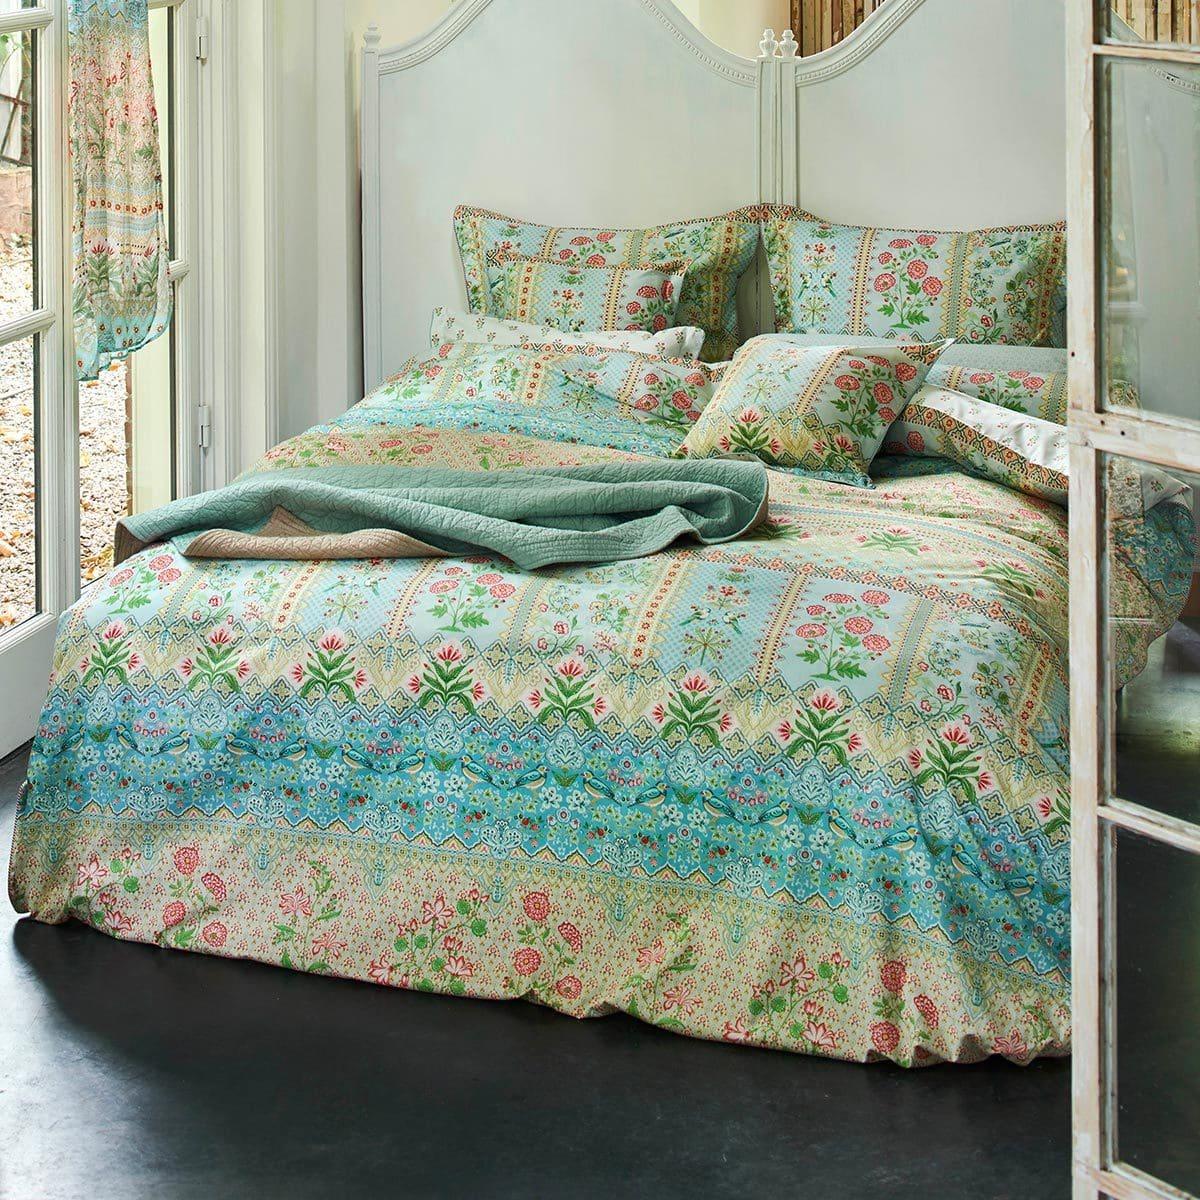 pip studio wendebettw sche darjeeling multi g nstig online. Black Bedroom Furniture Sets. Home Design Ideas